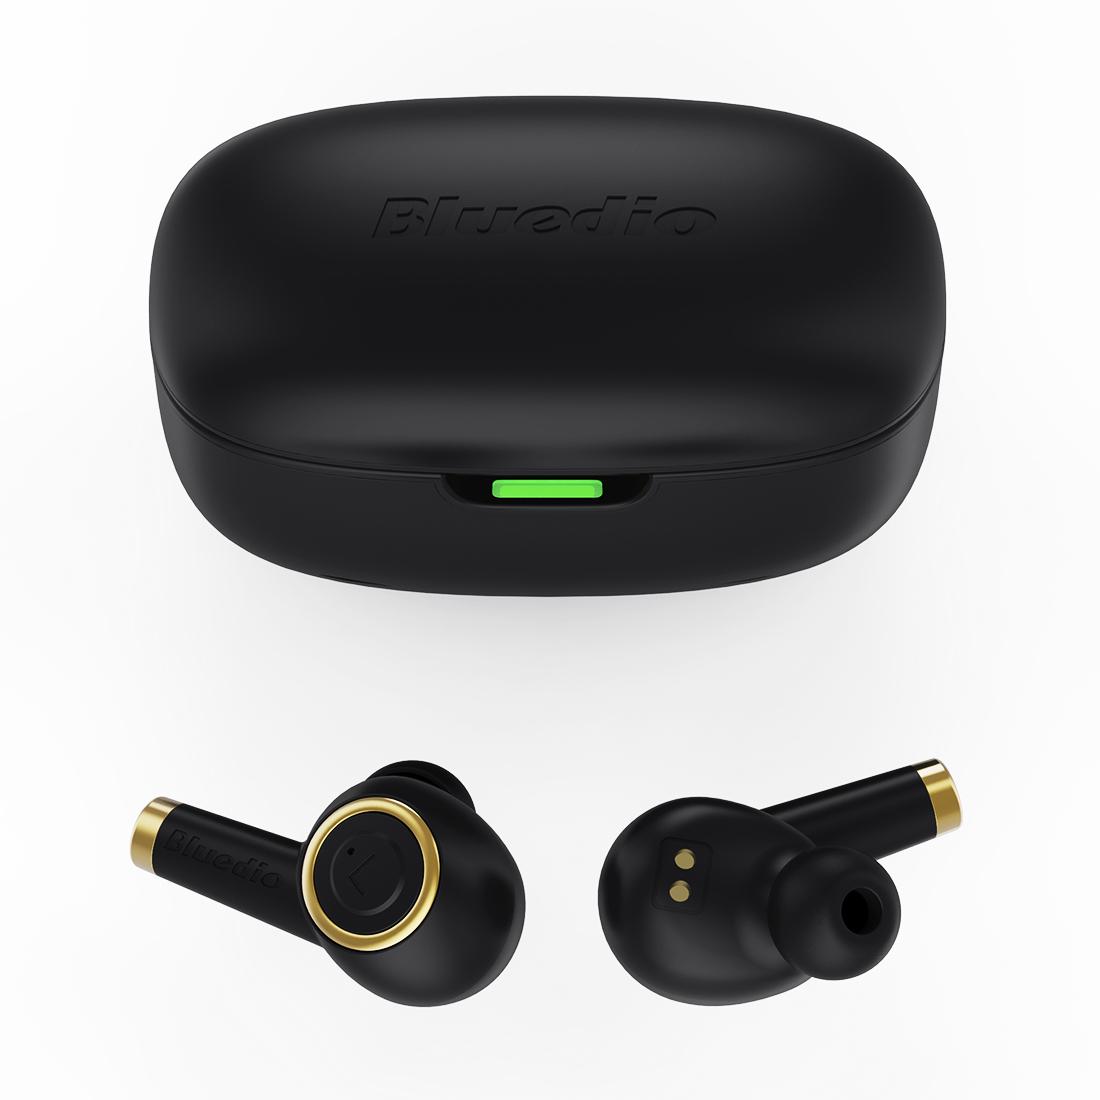 Bluedio Particle Waterproof Low Latency True Wireless Stereo Earbuds Headphones